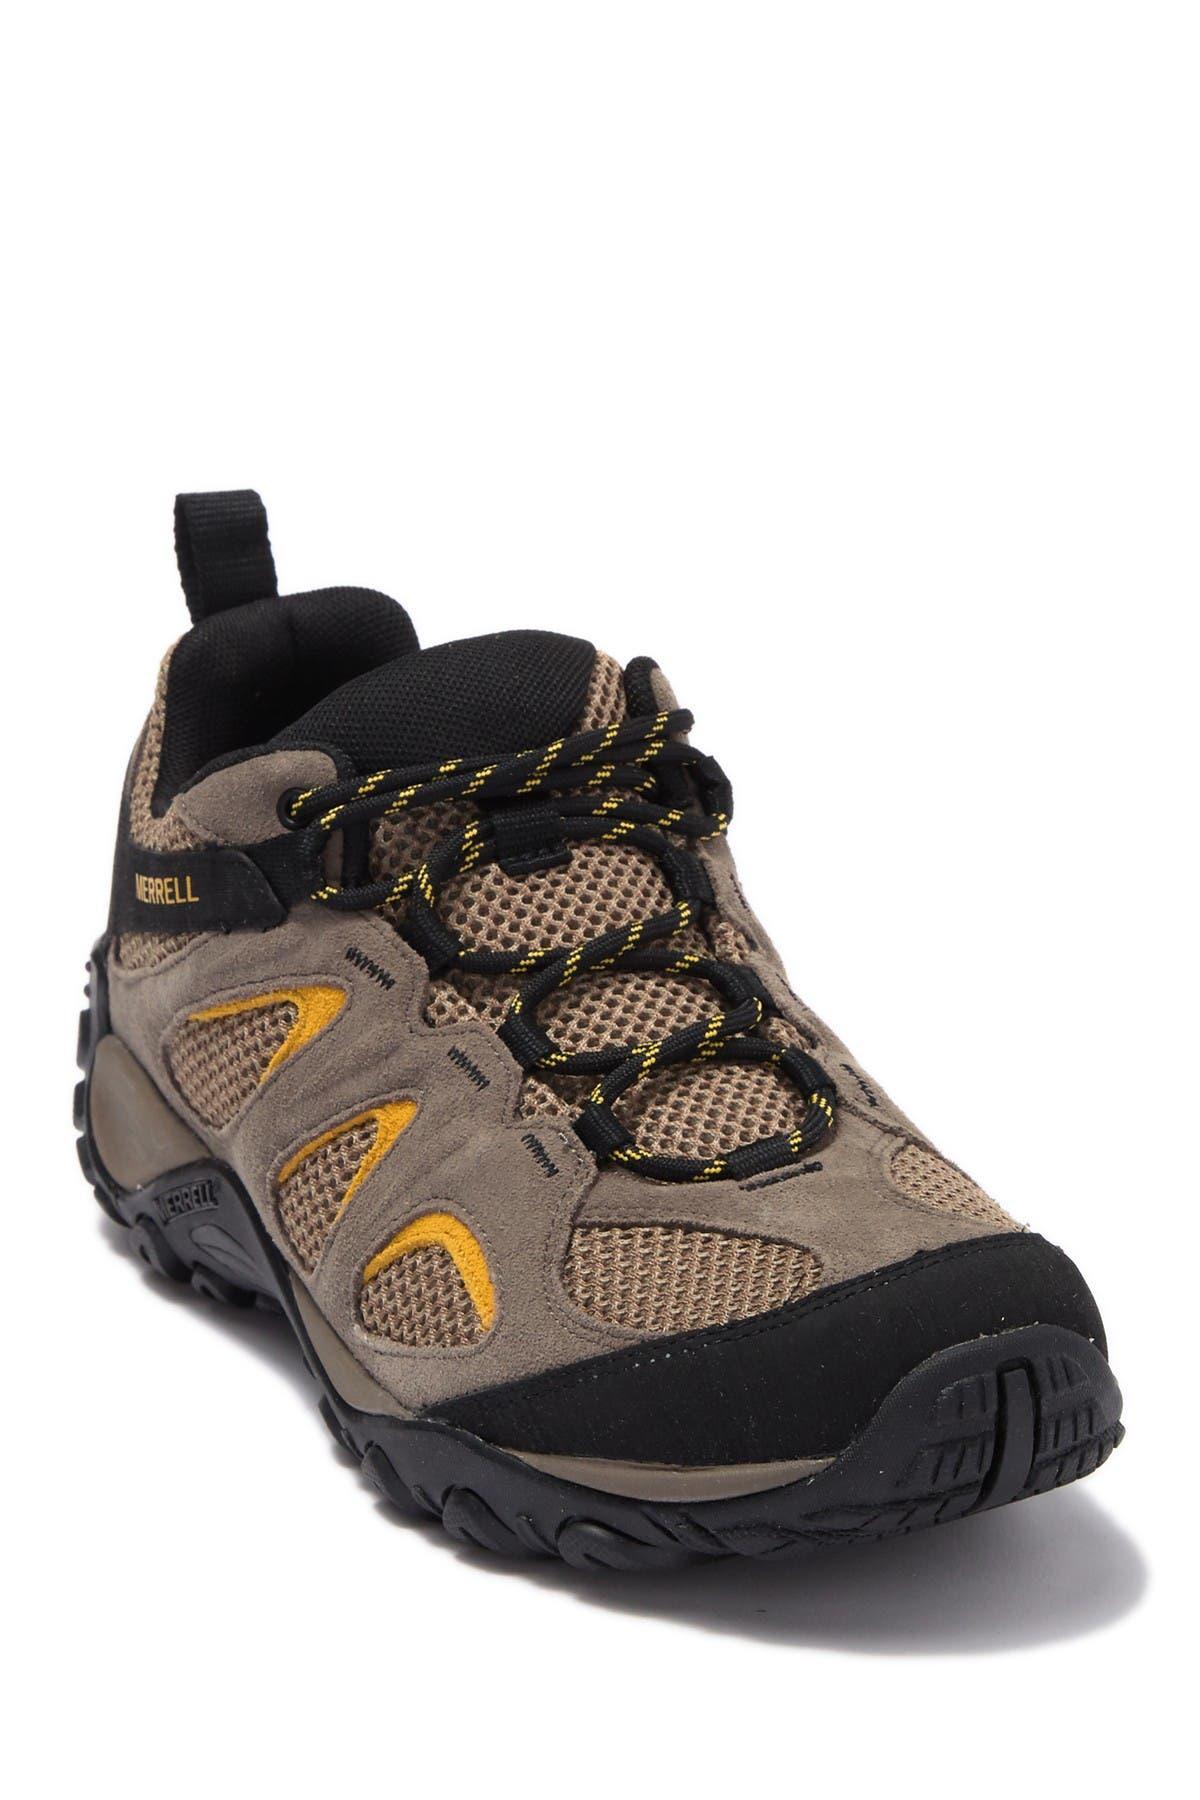 Image of Merrell Yokota 2 Hiking Sneaker